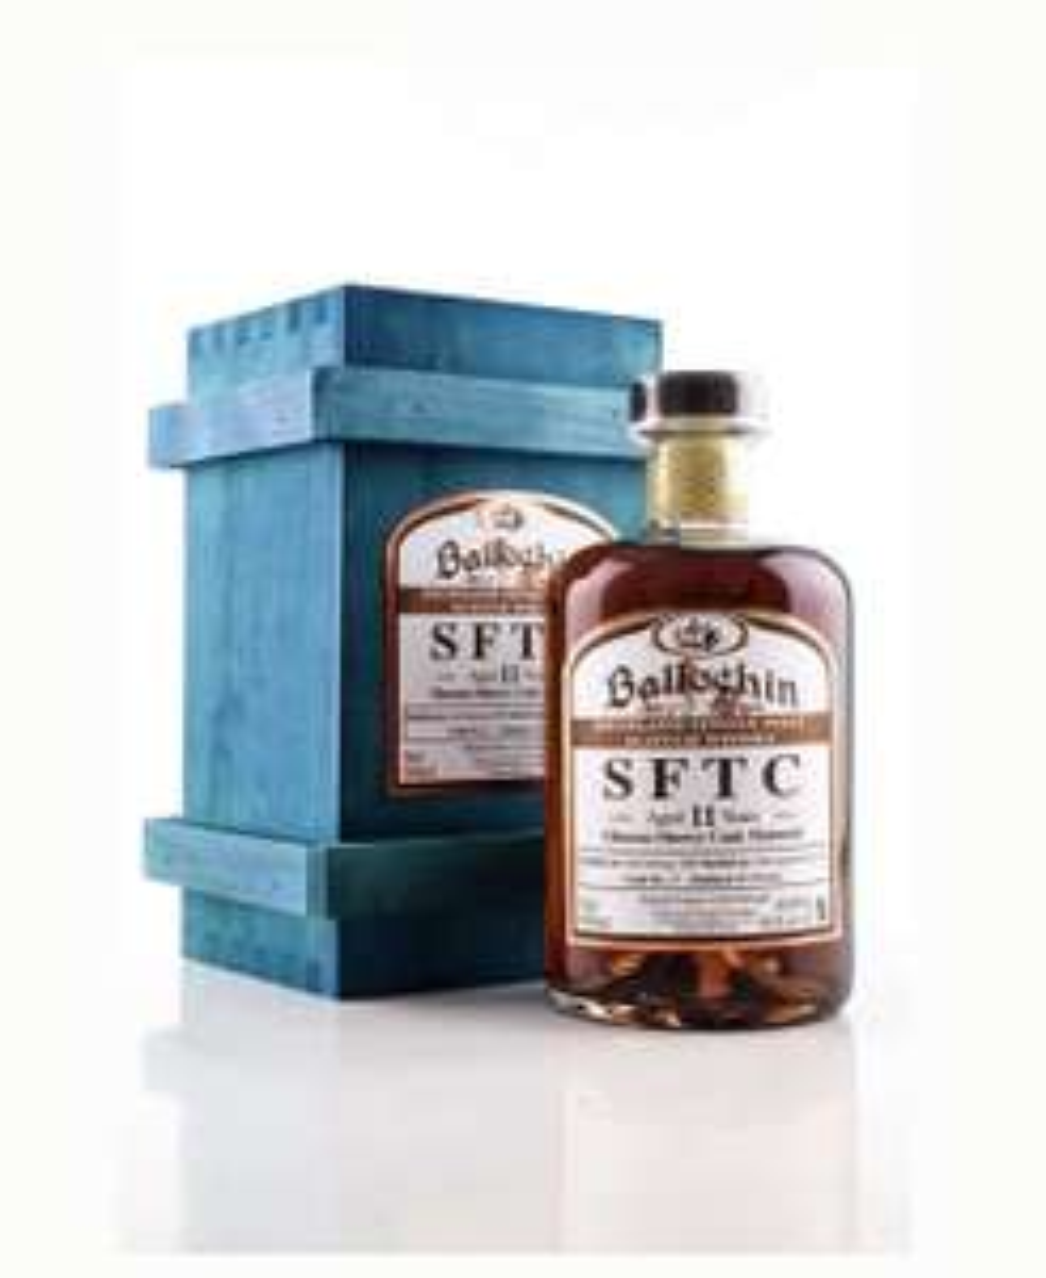 Ballechin 11 Jahre 2007/2018 SFTC Oloroso Sherry Cask Matured. Single Malt Whisky